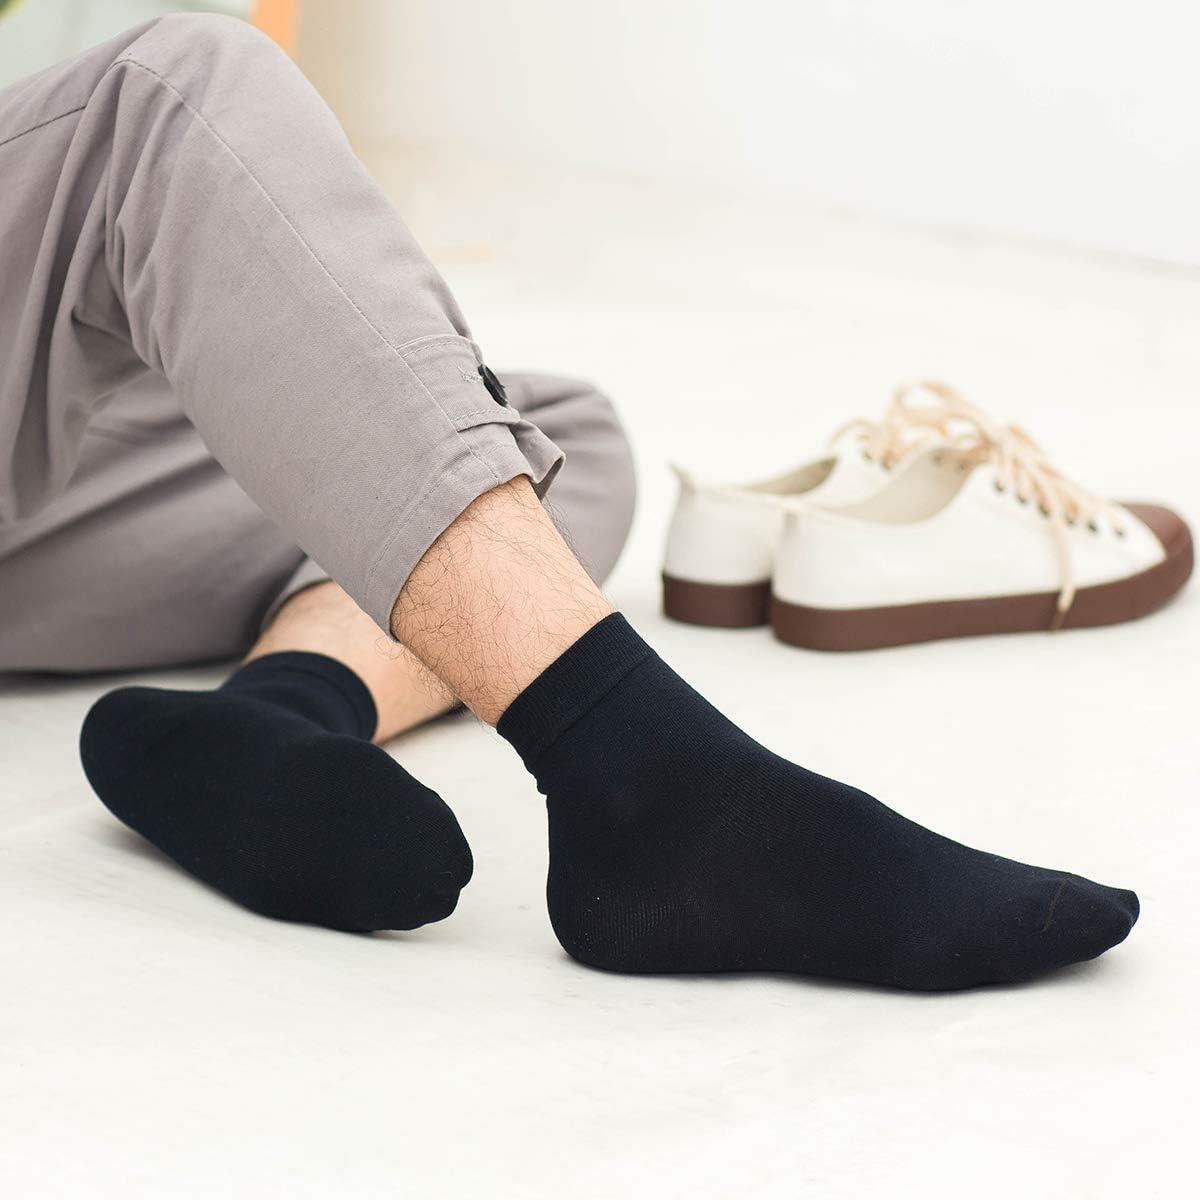 Camfosy Damen Baumwoll Socke Herbst Winter Warm Bequem Freie Gr/ö/ße Schwarz Grau